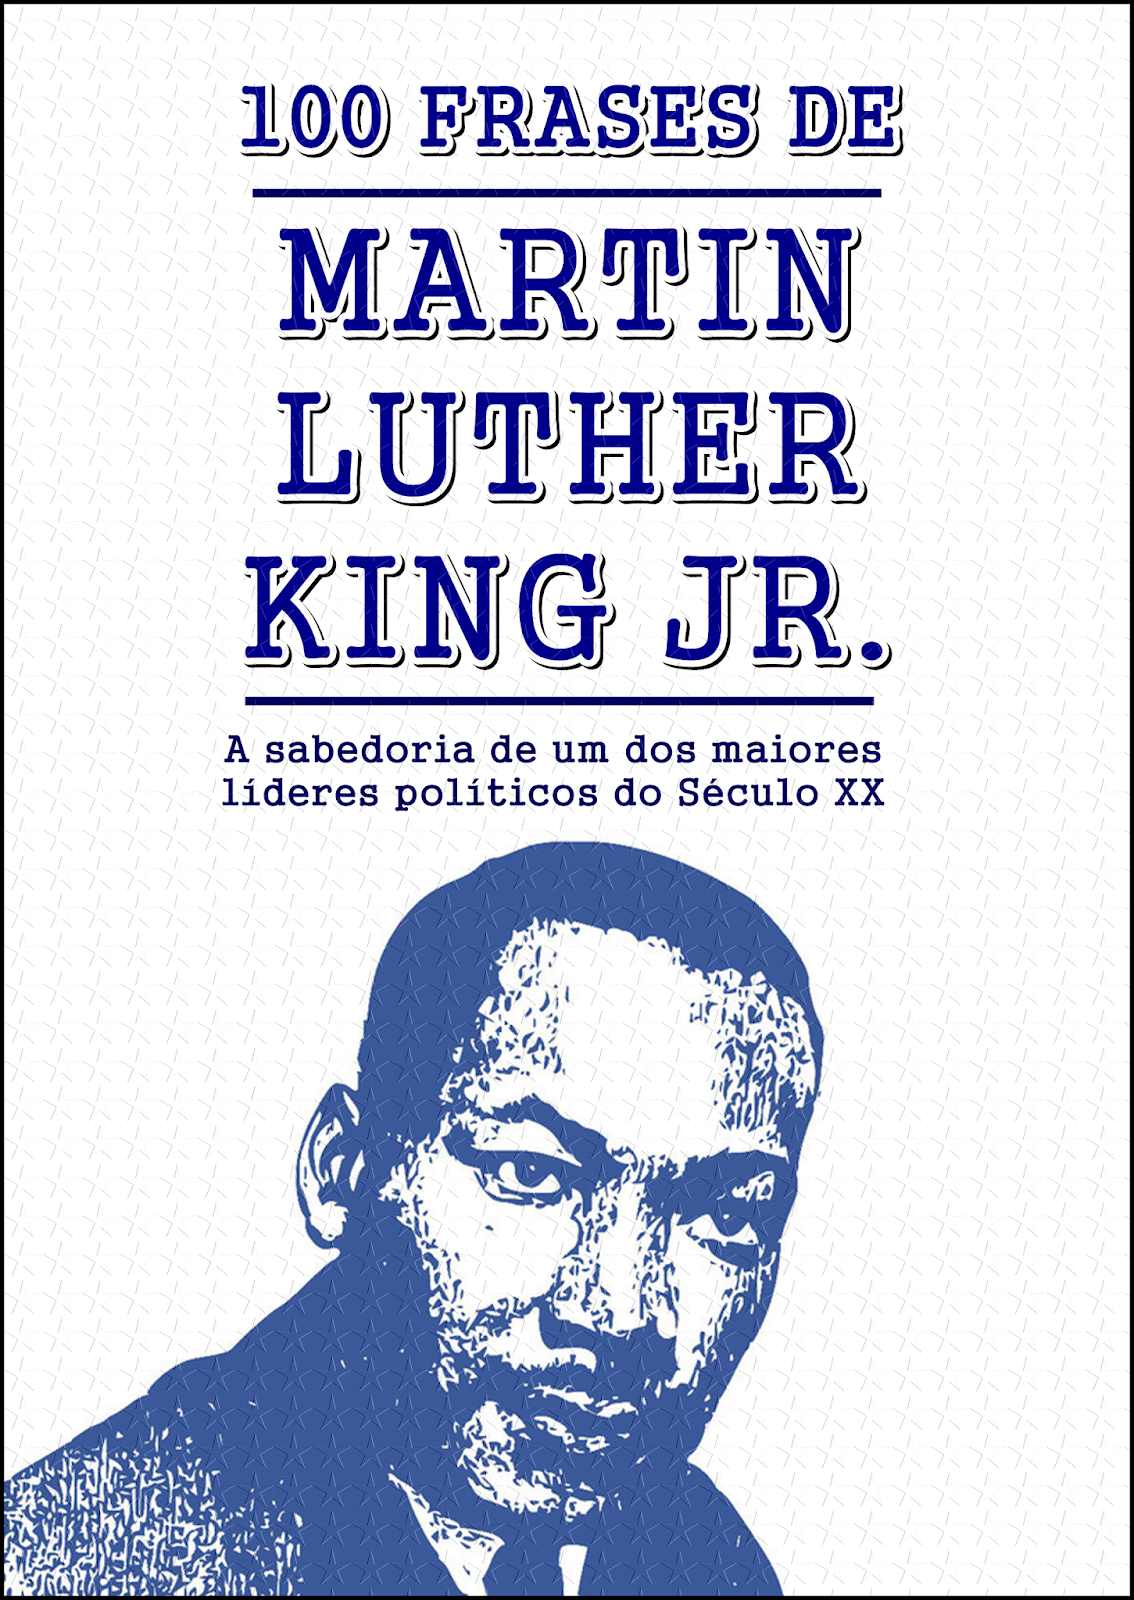 100 FRASES DE MARTIN LUTHER KING - Martin Luther King Jr. (1929 – 1968) foi  um pastor protestante e ativista político norte americano. 692ea89383c6d